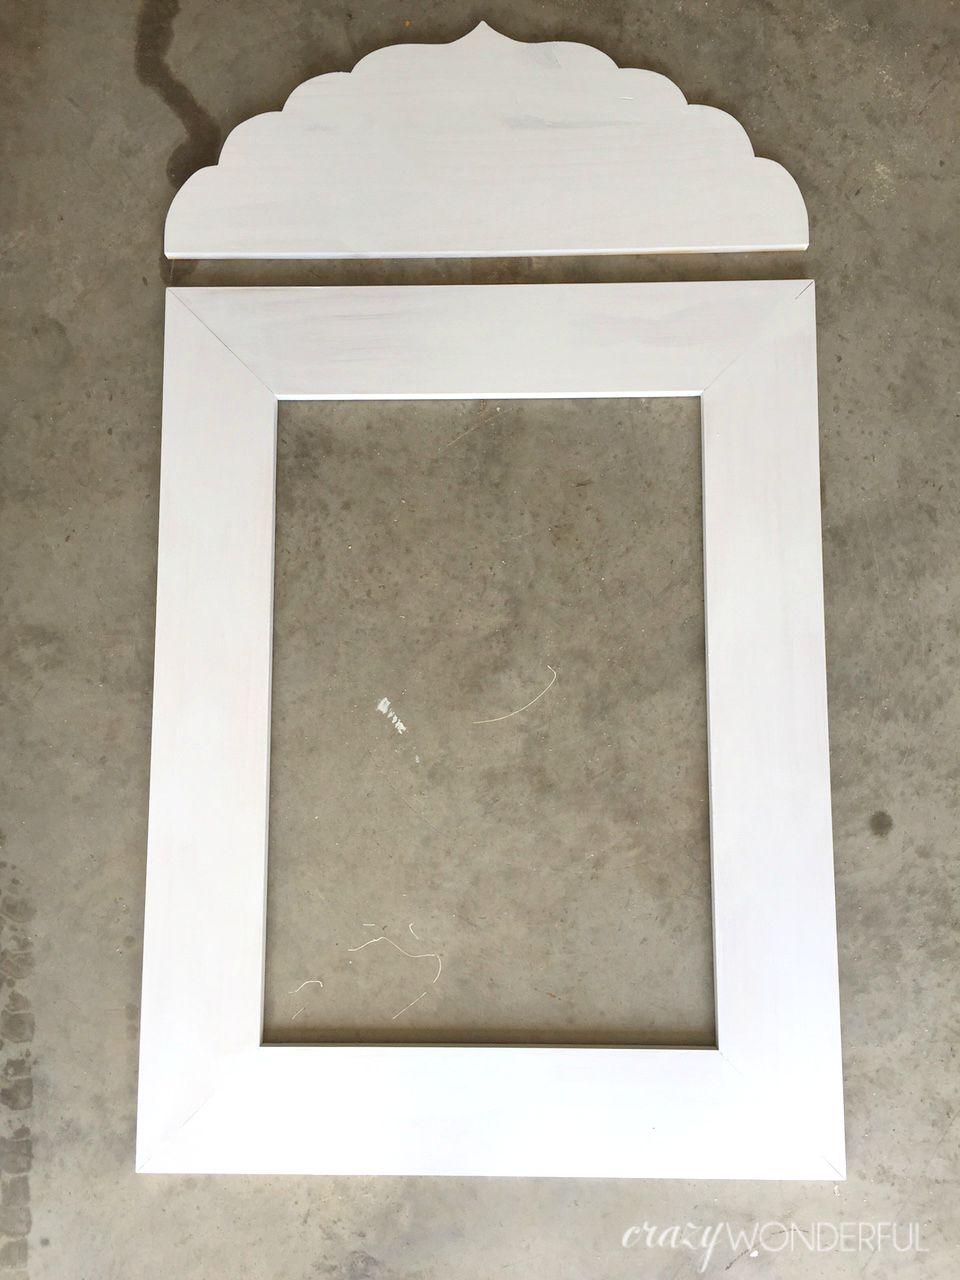 Diy inlay mirror 2 ways crazy wonderful jeuxipadfo Image collections